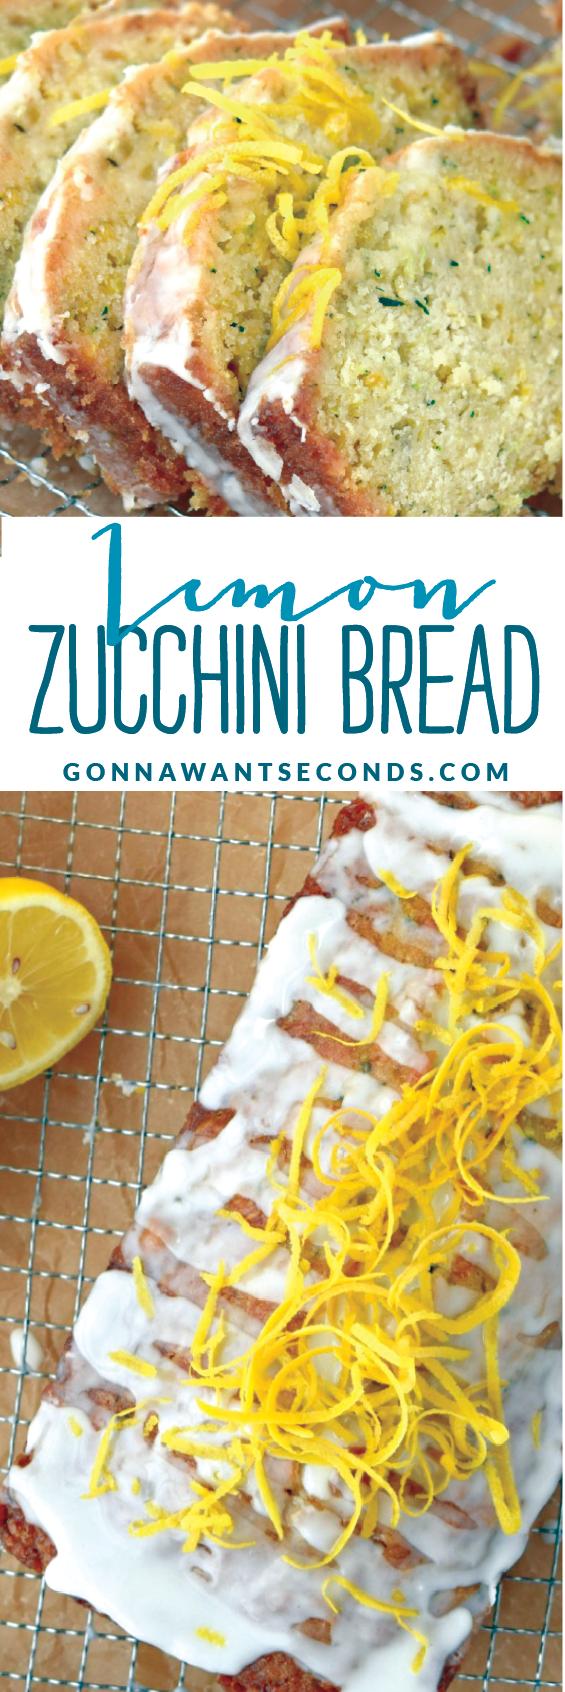 Lemon-Zucchini-Bread-PIN-04